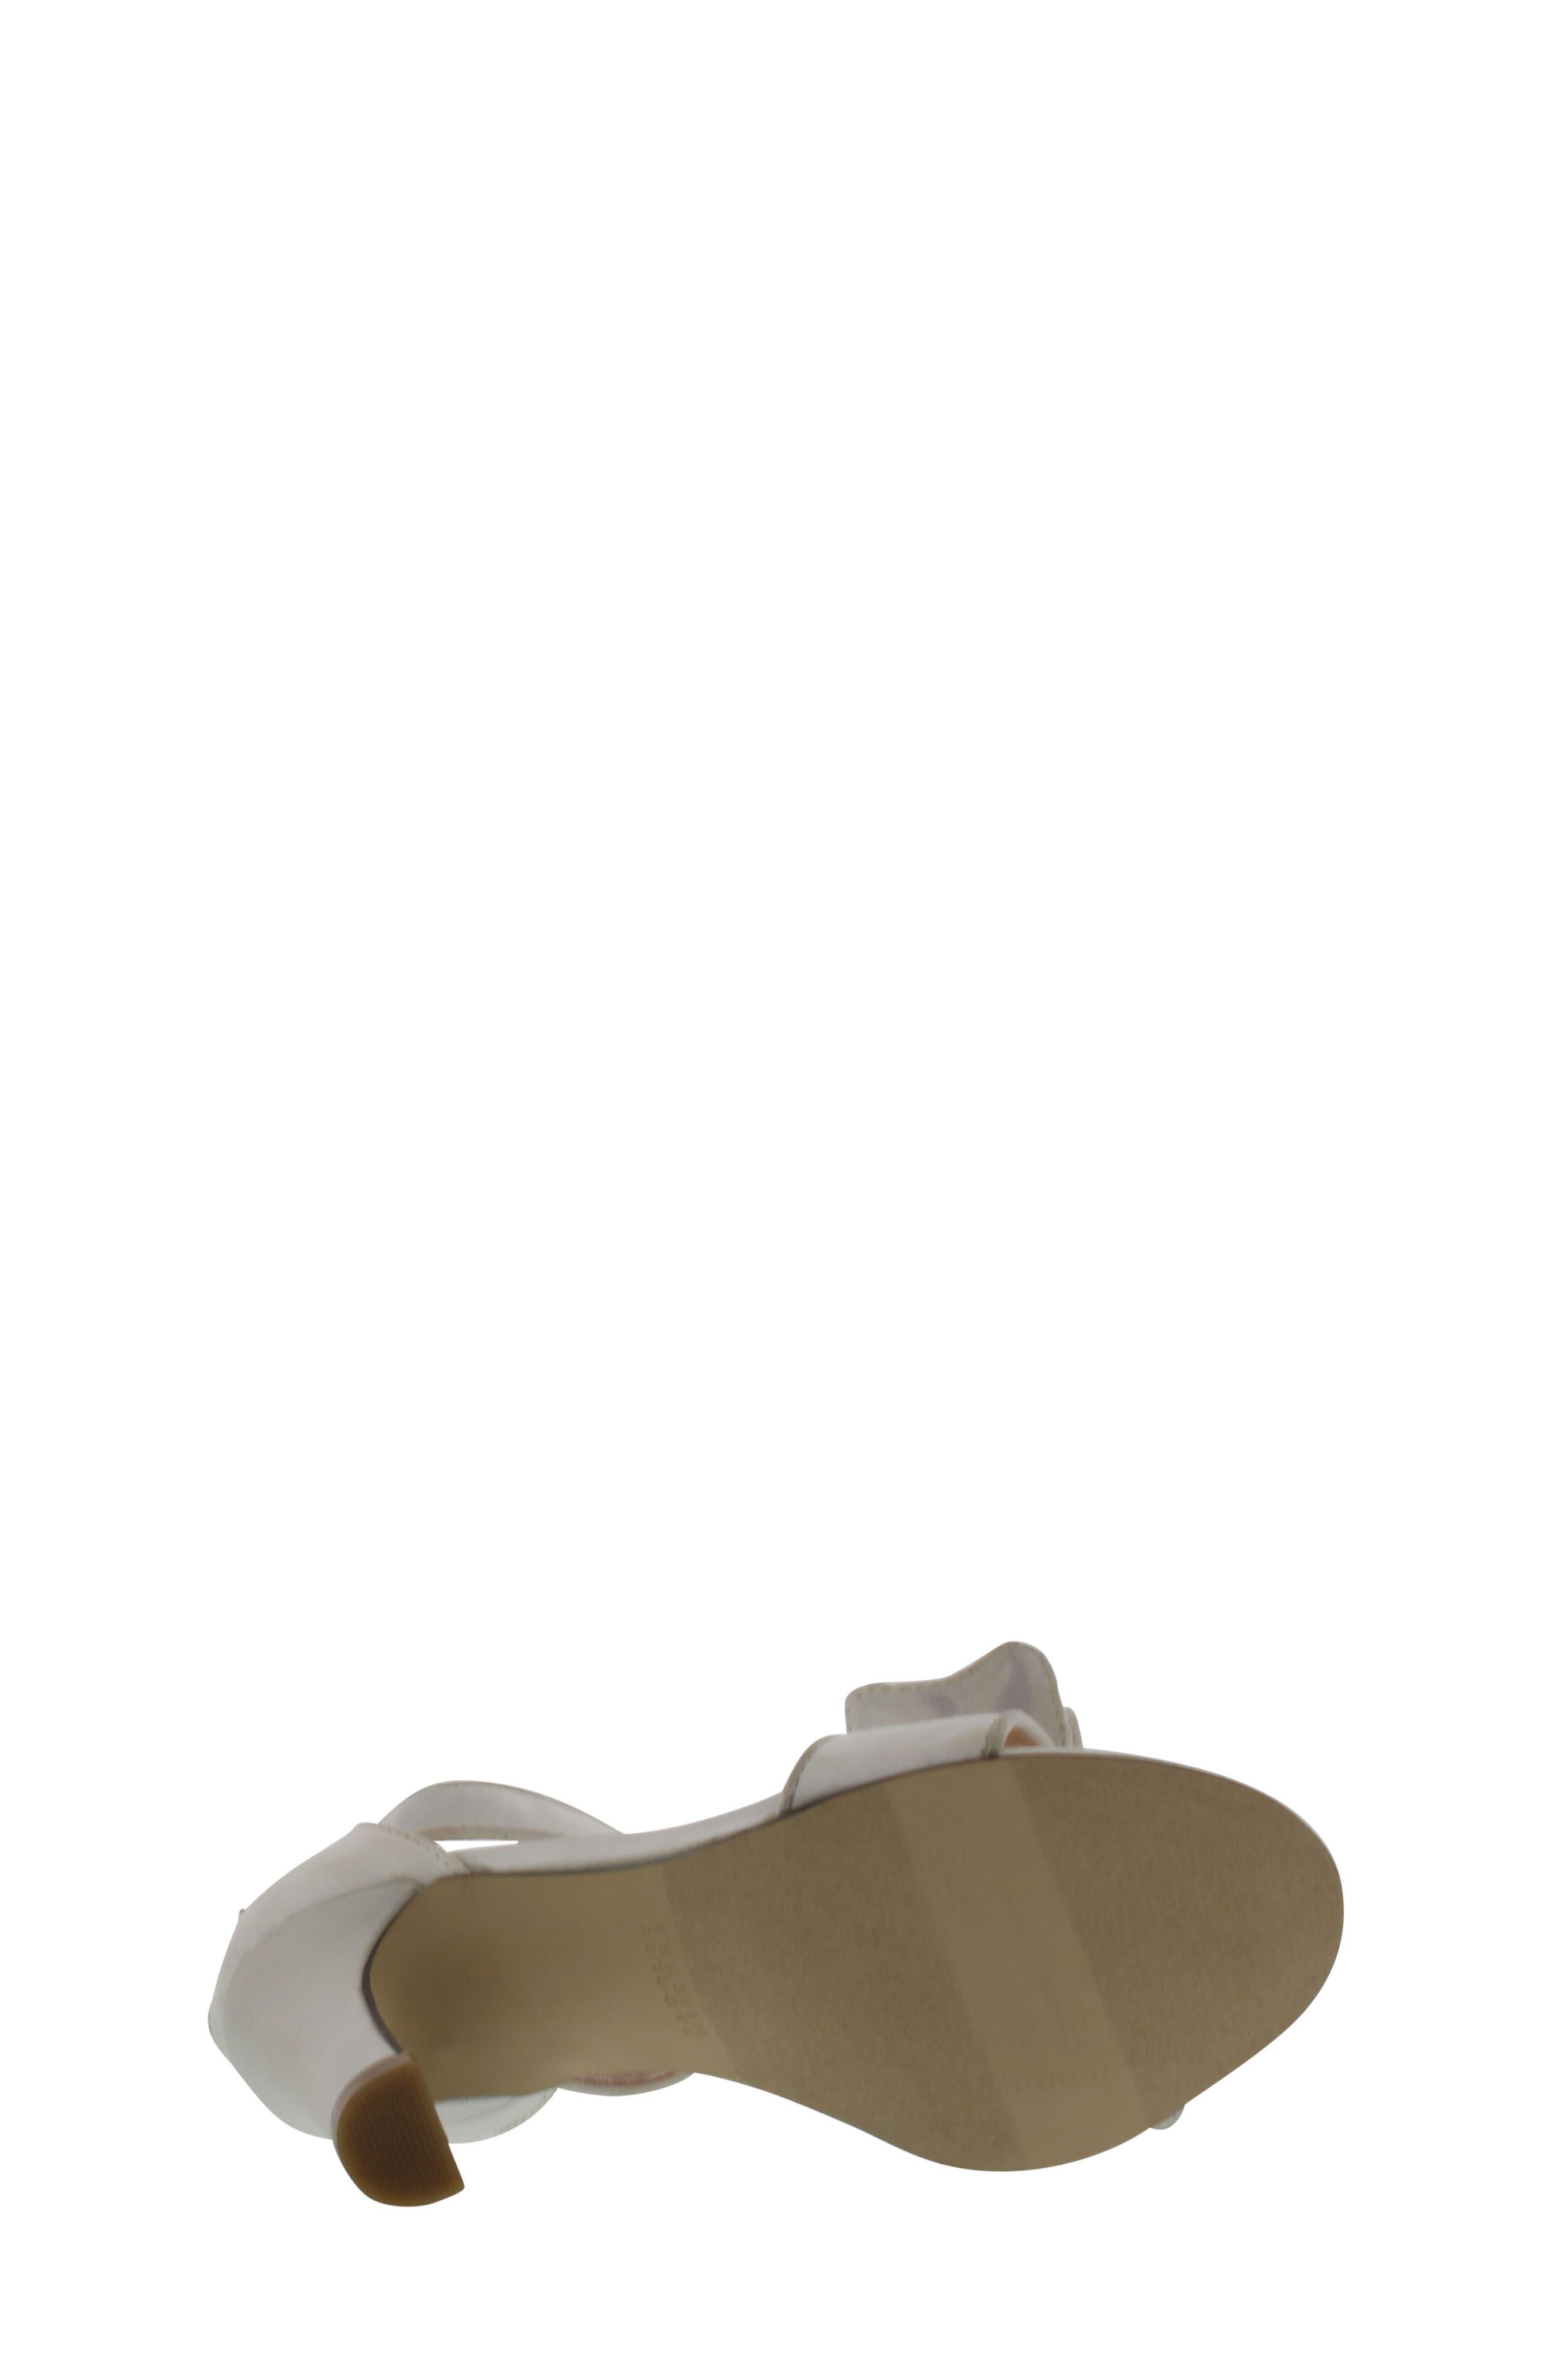 Kendall Embellished Bow Sandal,                             Alternate thumbnail 6, color,                             White Multi